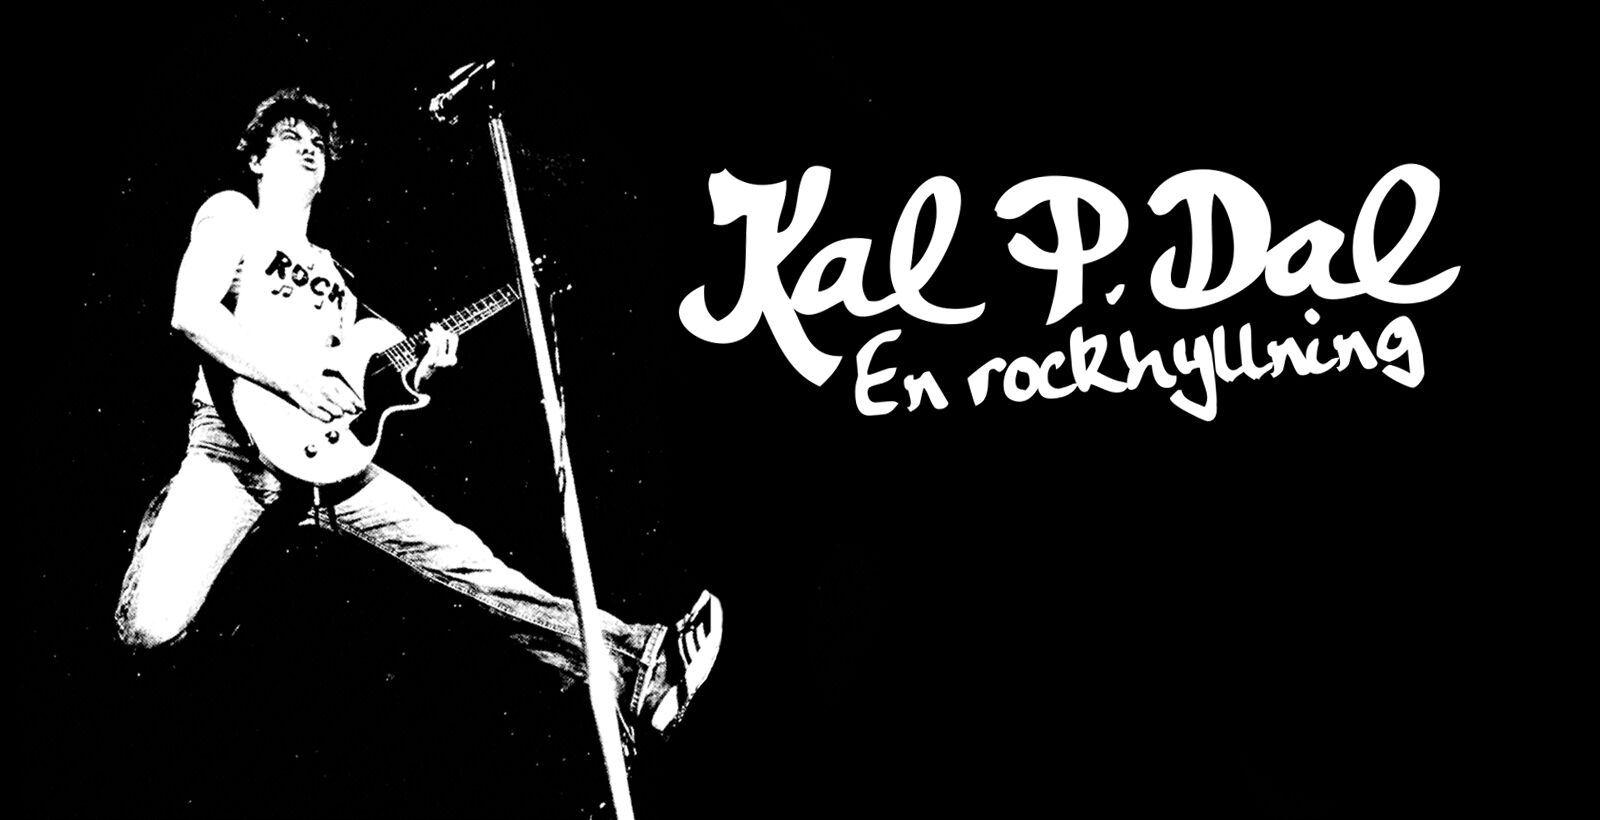 Kal P. Dal